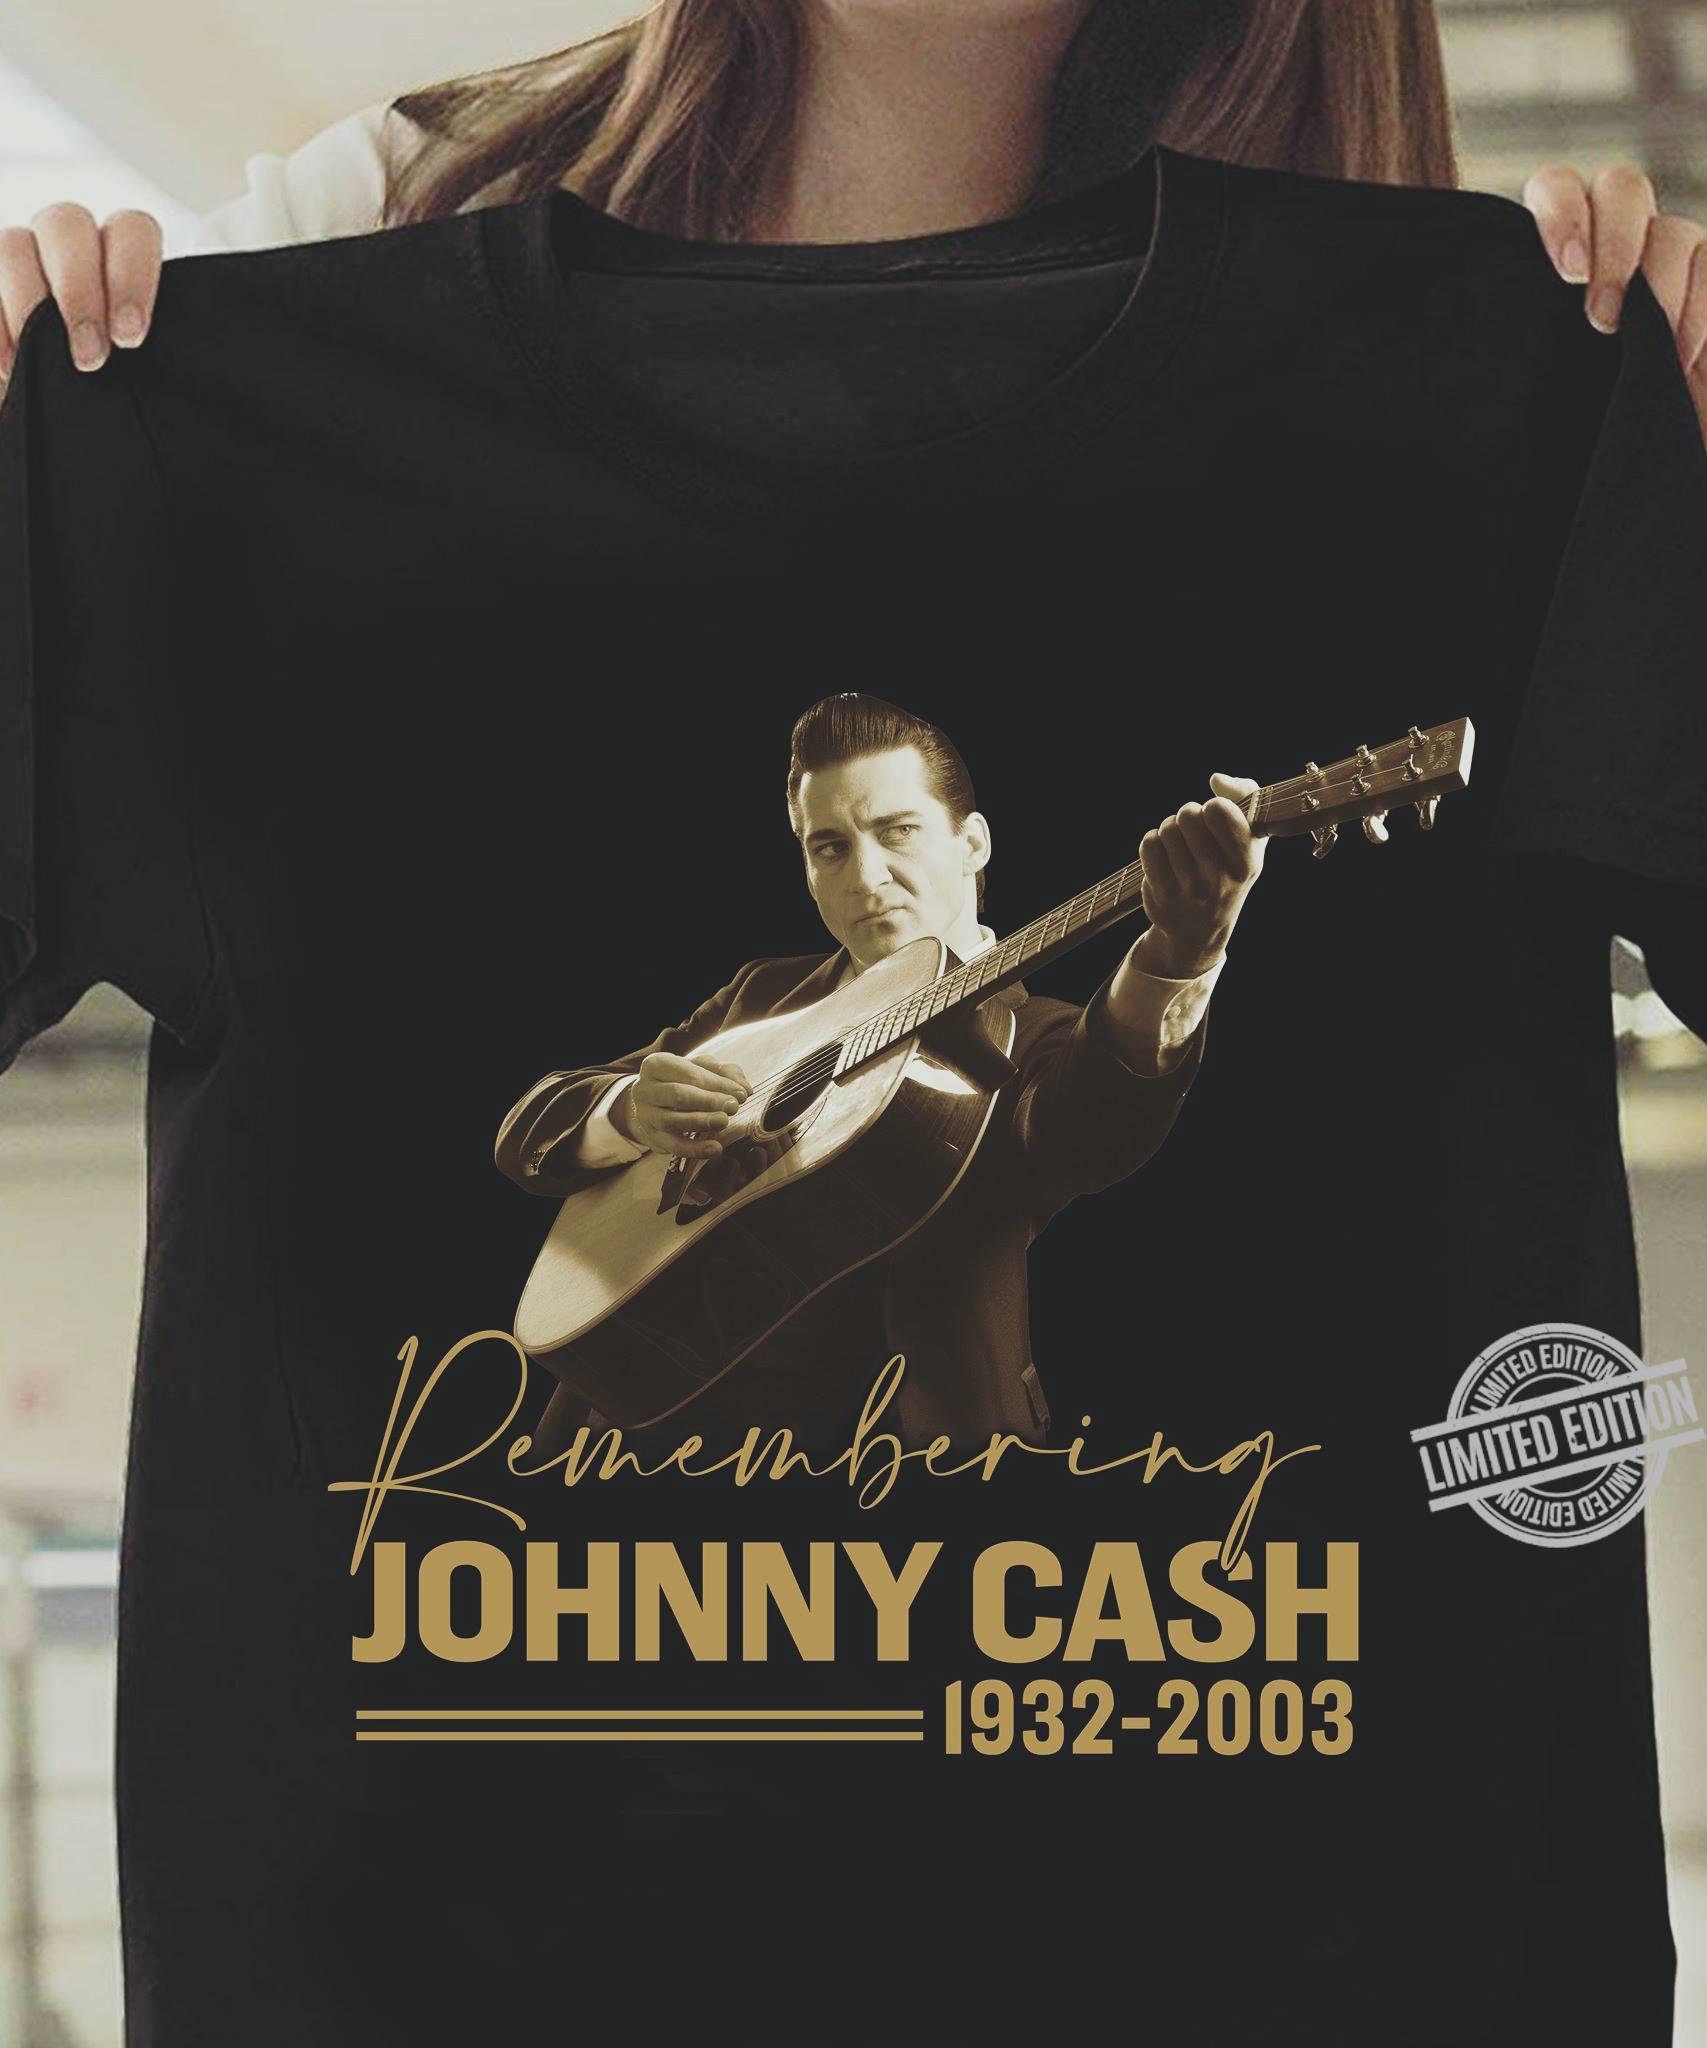 Johnny Cash 1932-2003 Shirt